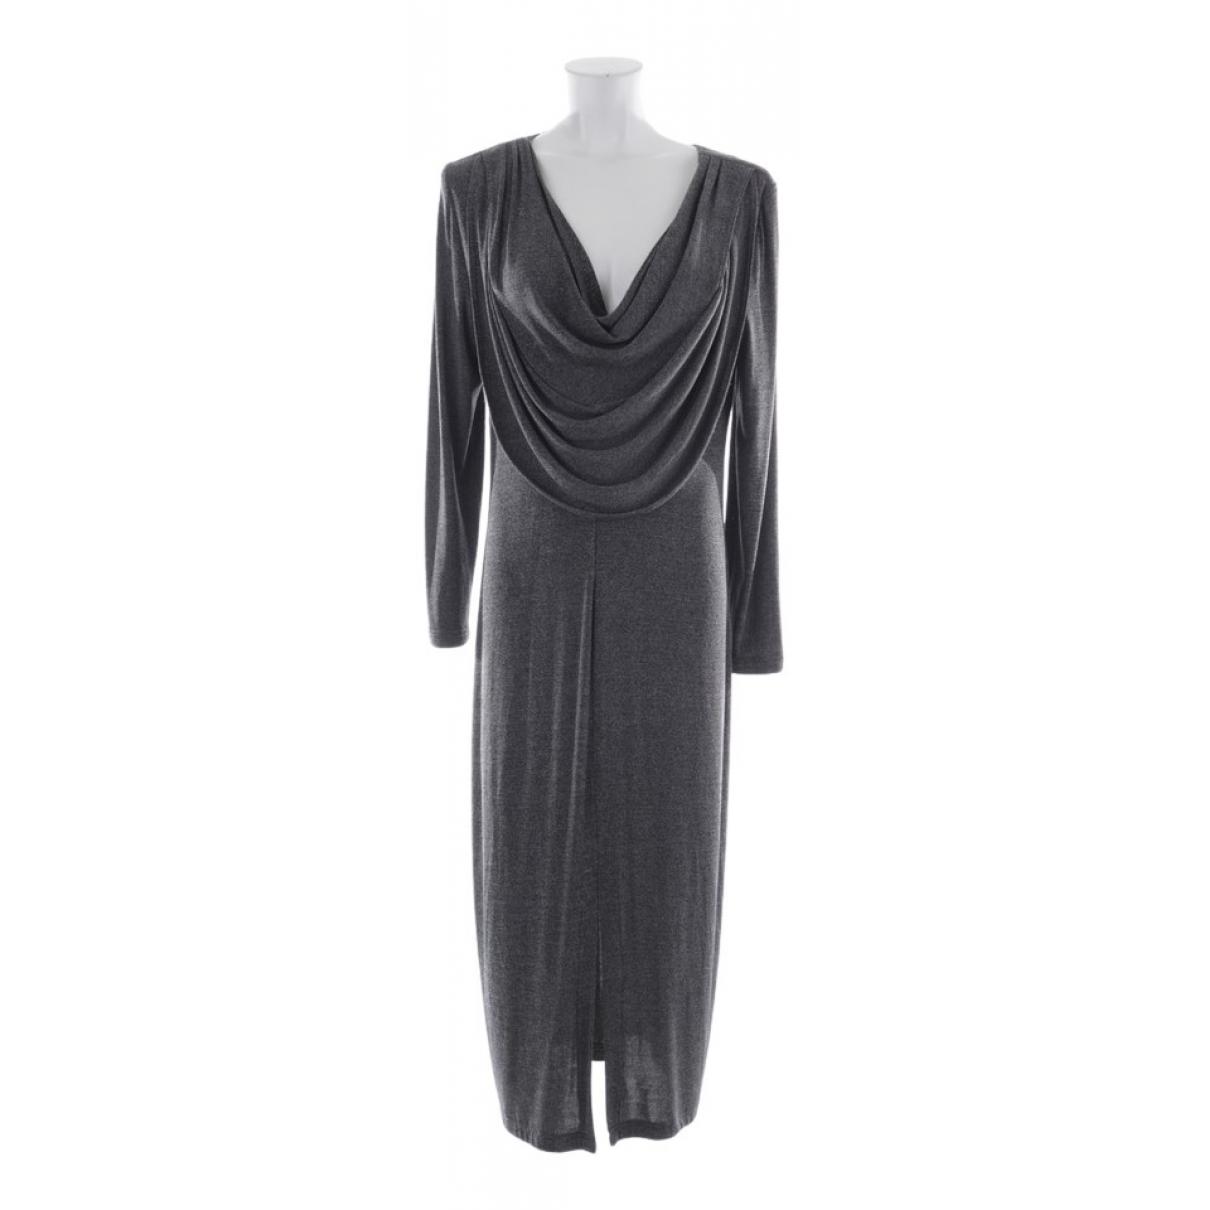 Joseph Ribkoff \N Kleid in  Grau Synthetik